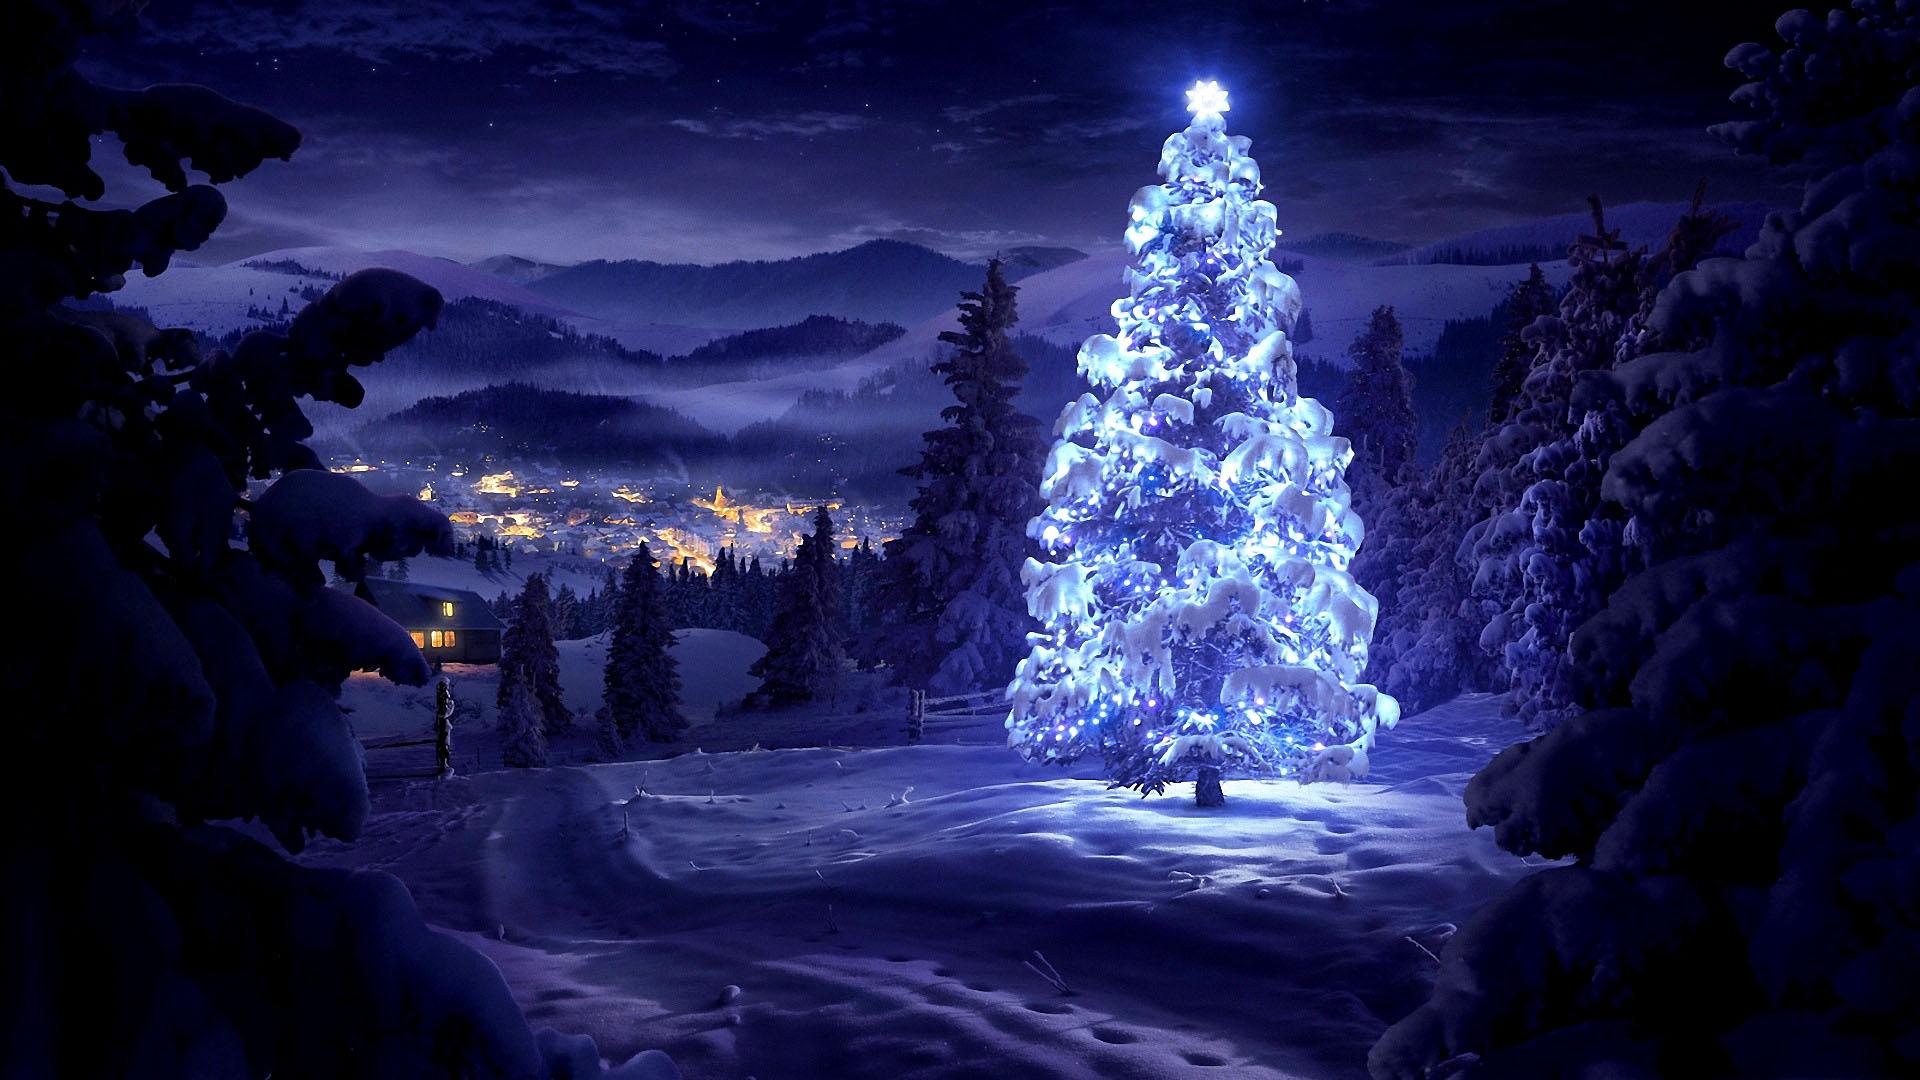 Merry Christmas Tree Wallpaper - HD Desktop Wallpapers | 4k HD